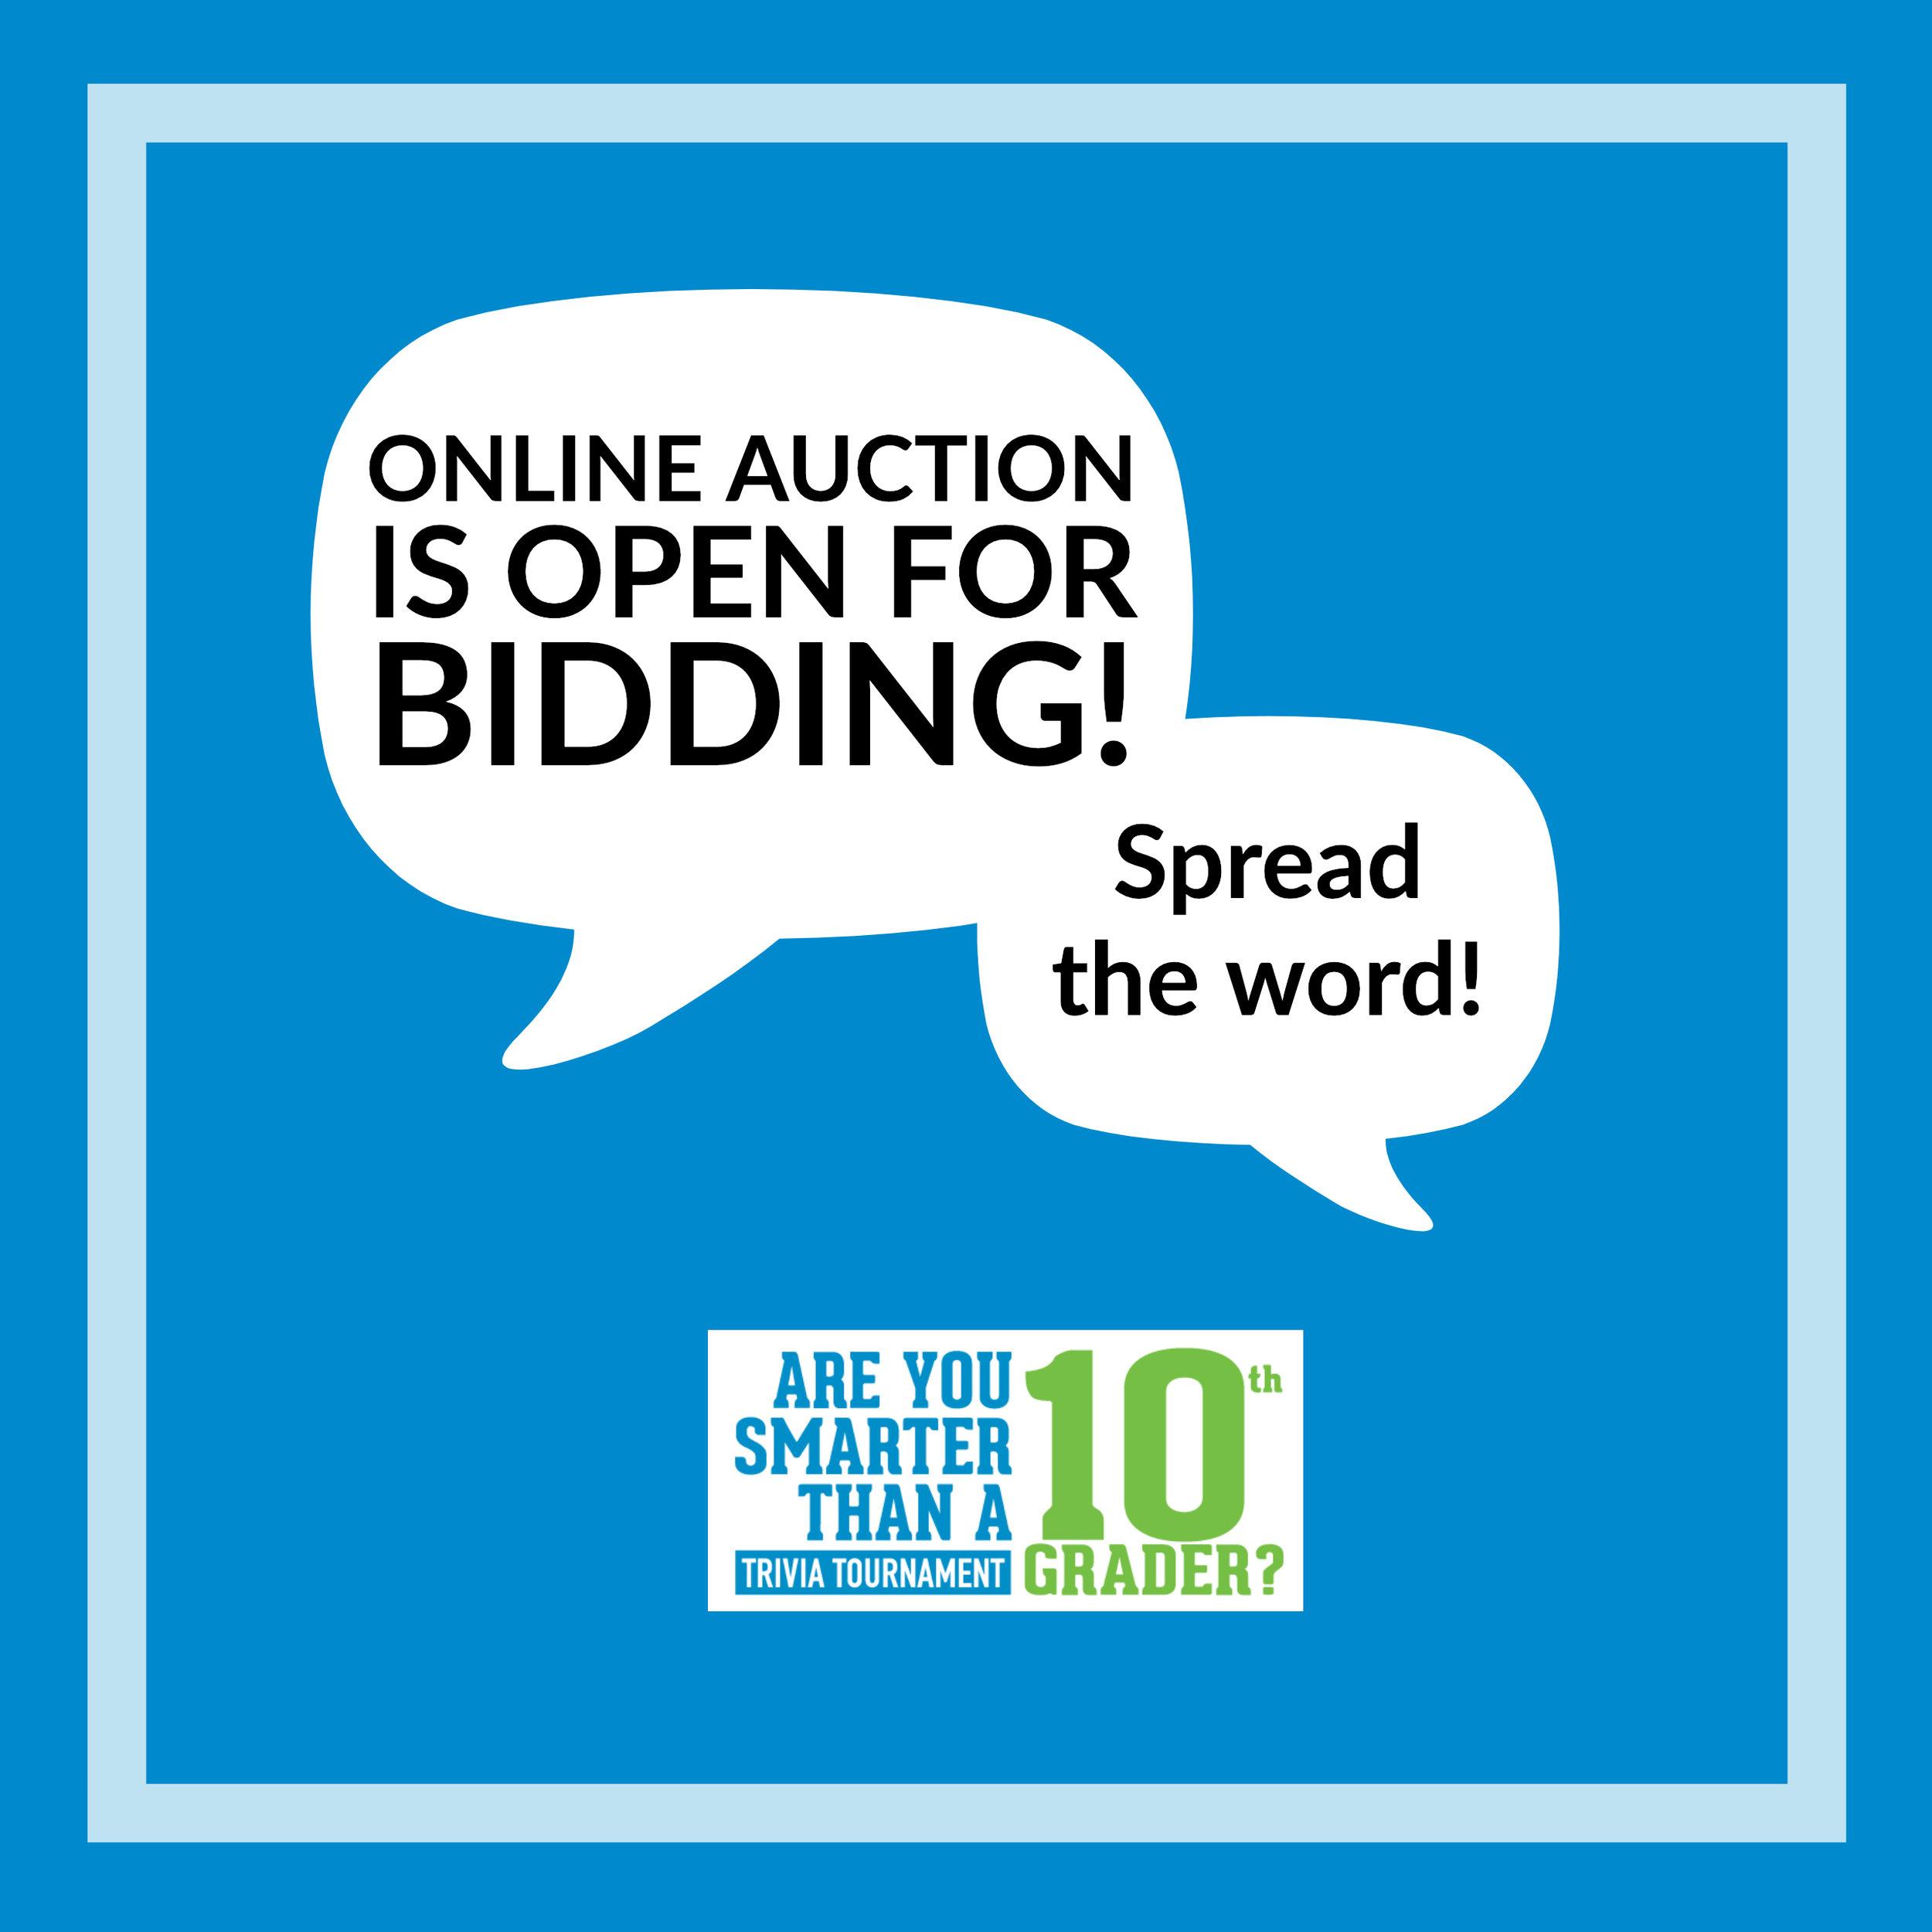 AYS_auctionopen.jpg